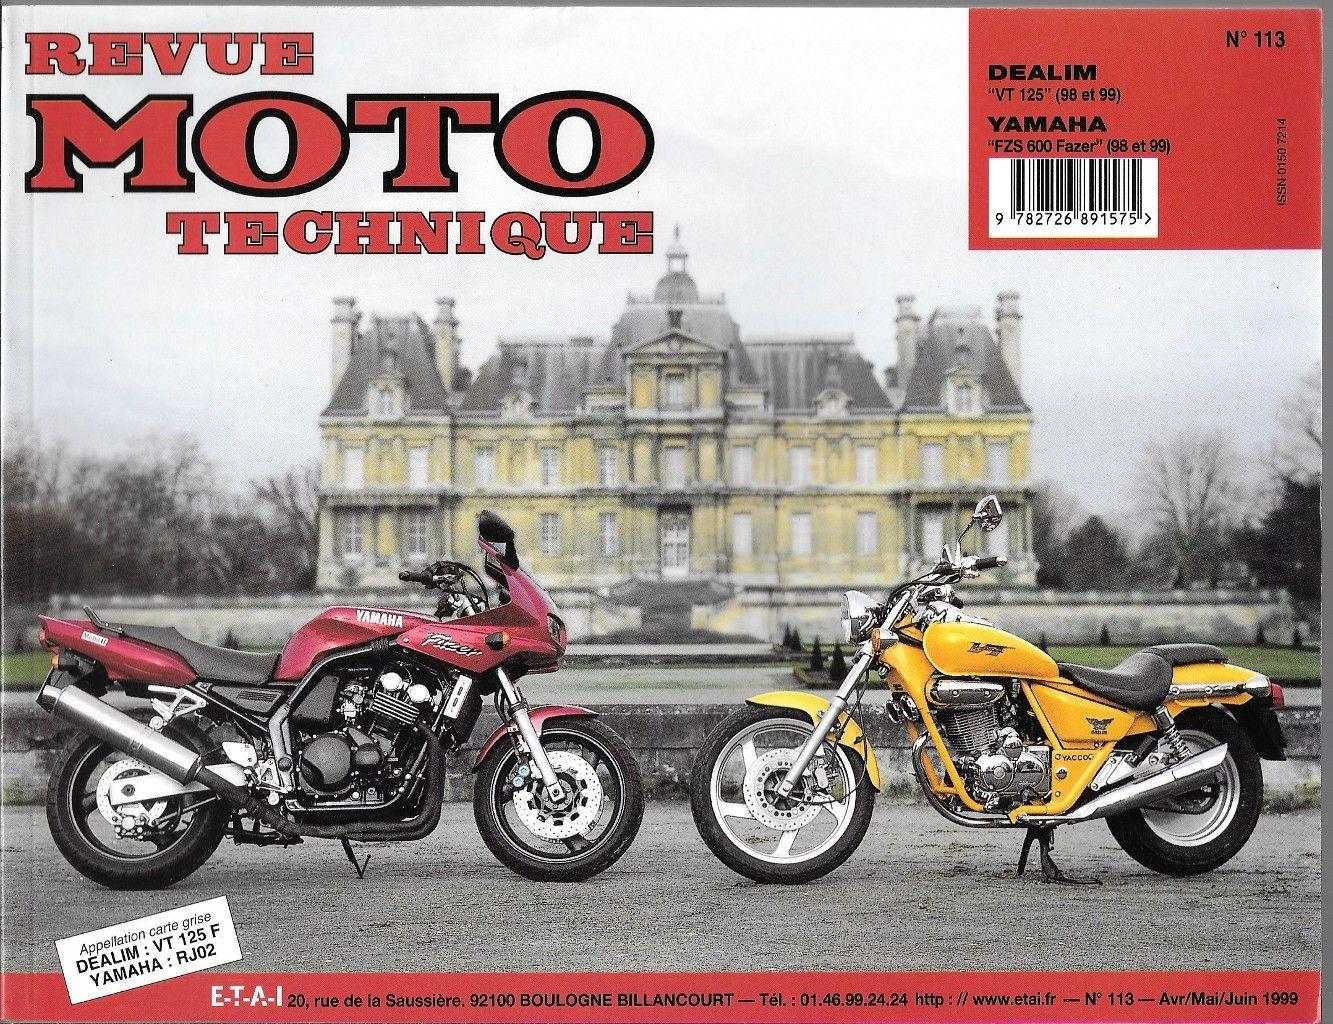 Revue Moto Technique 113.2 Daelim VT 125 / Yamaha FZS 600 FAZER